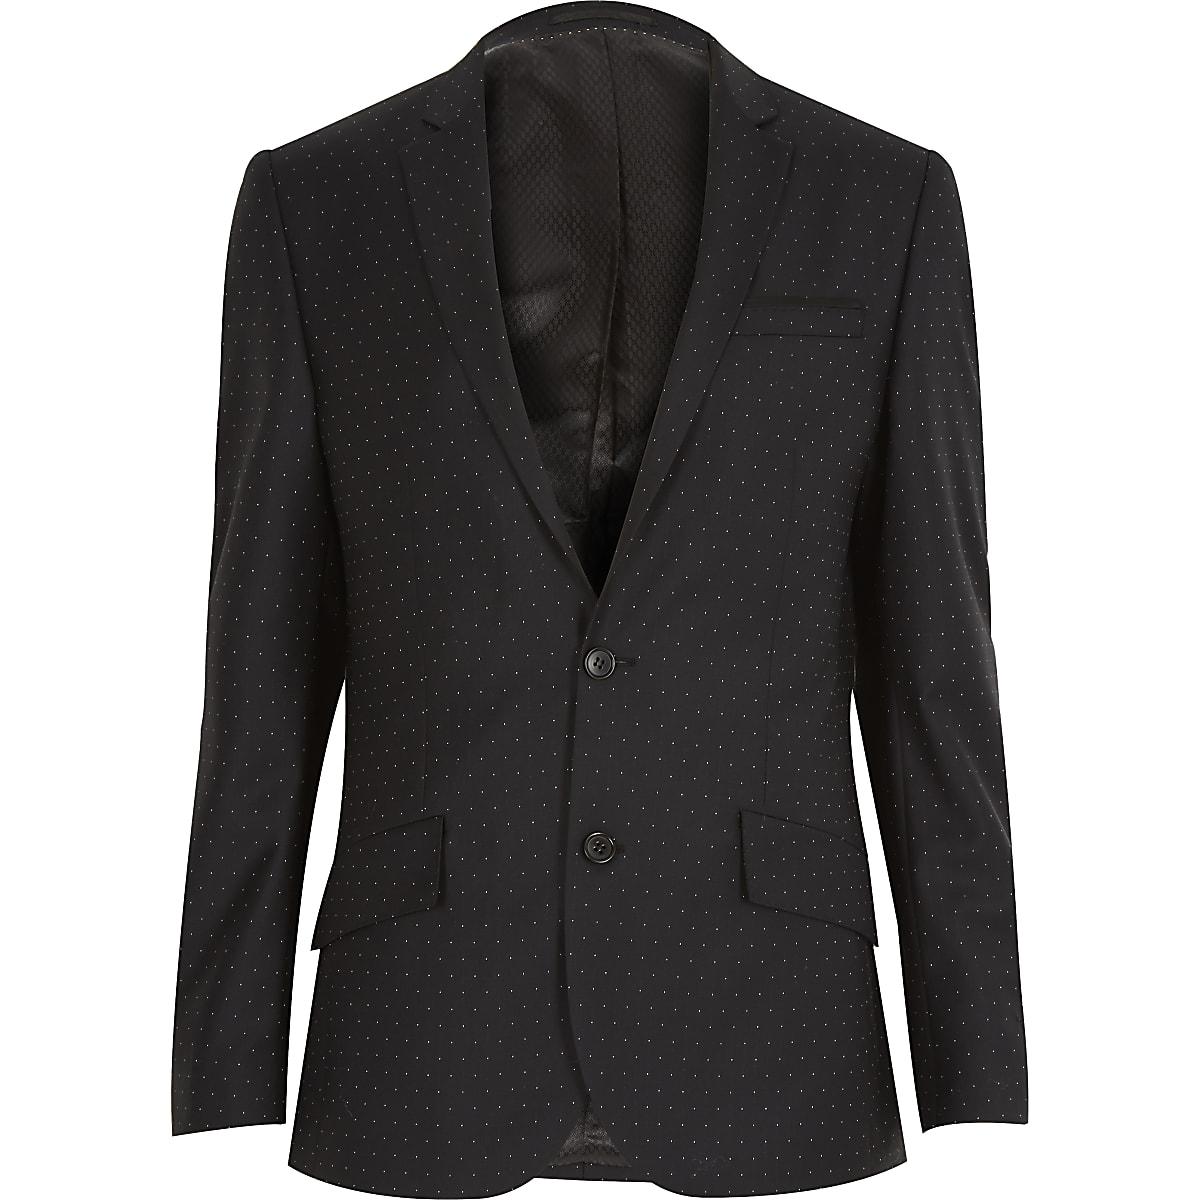 Black polka dot wool slim tux jacket